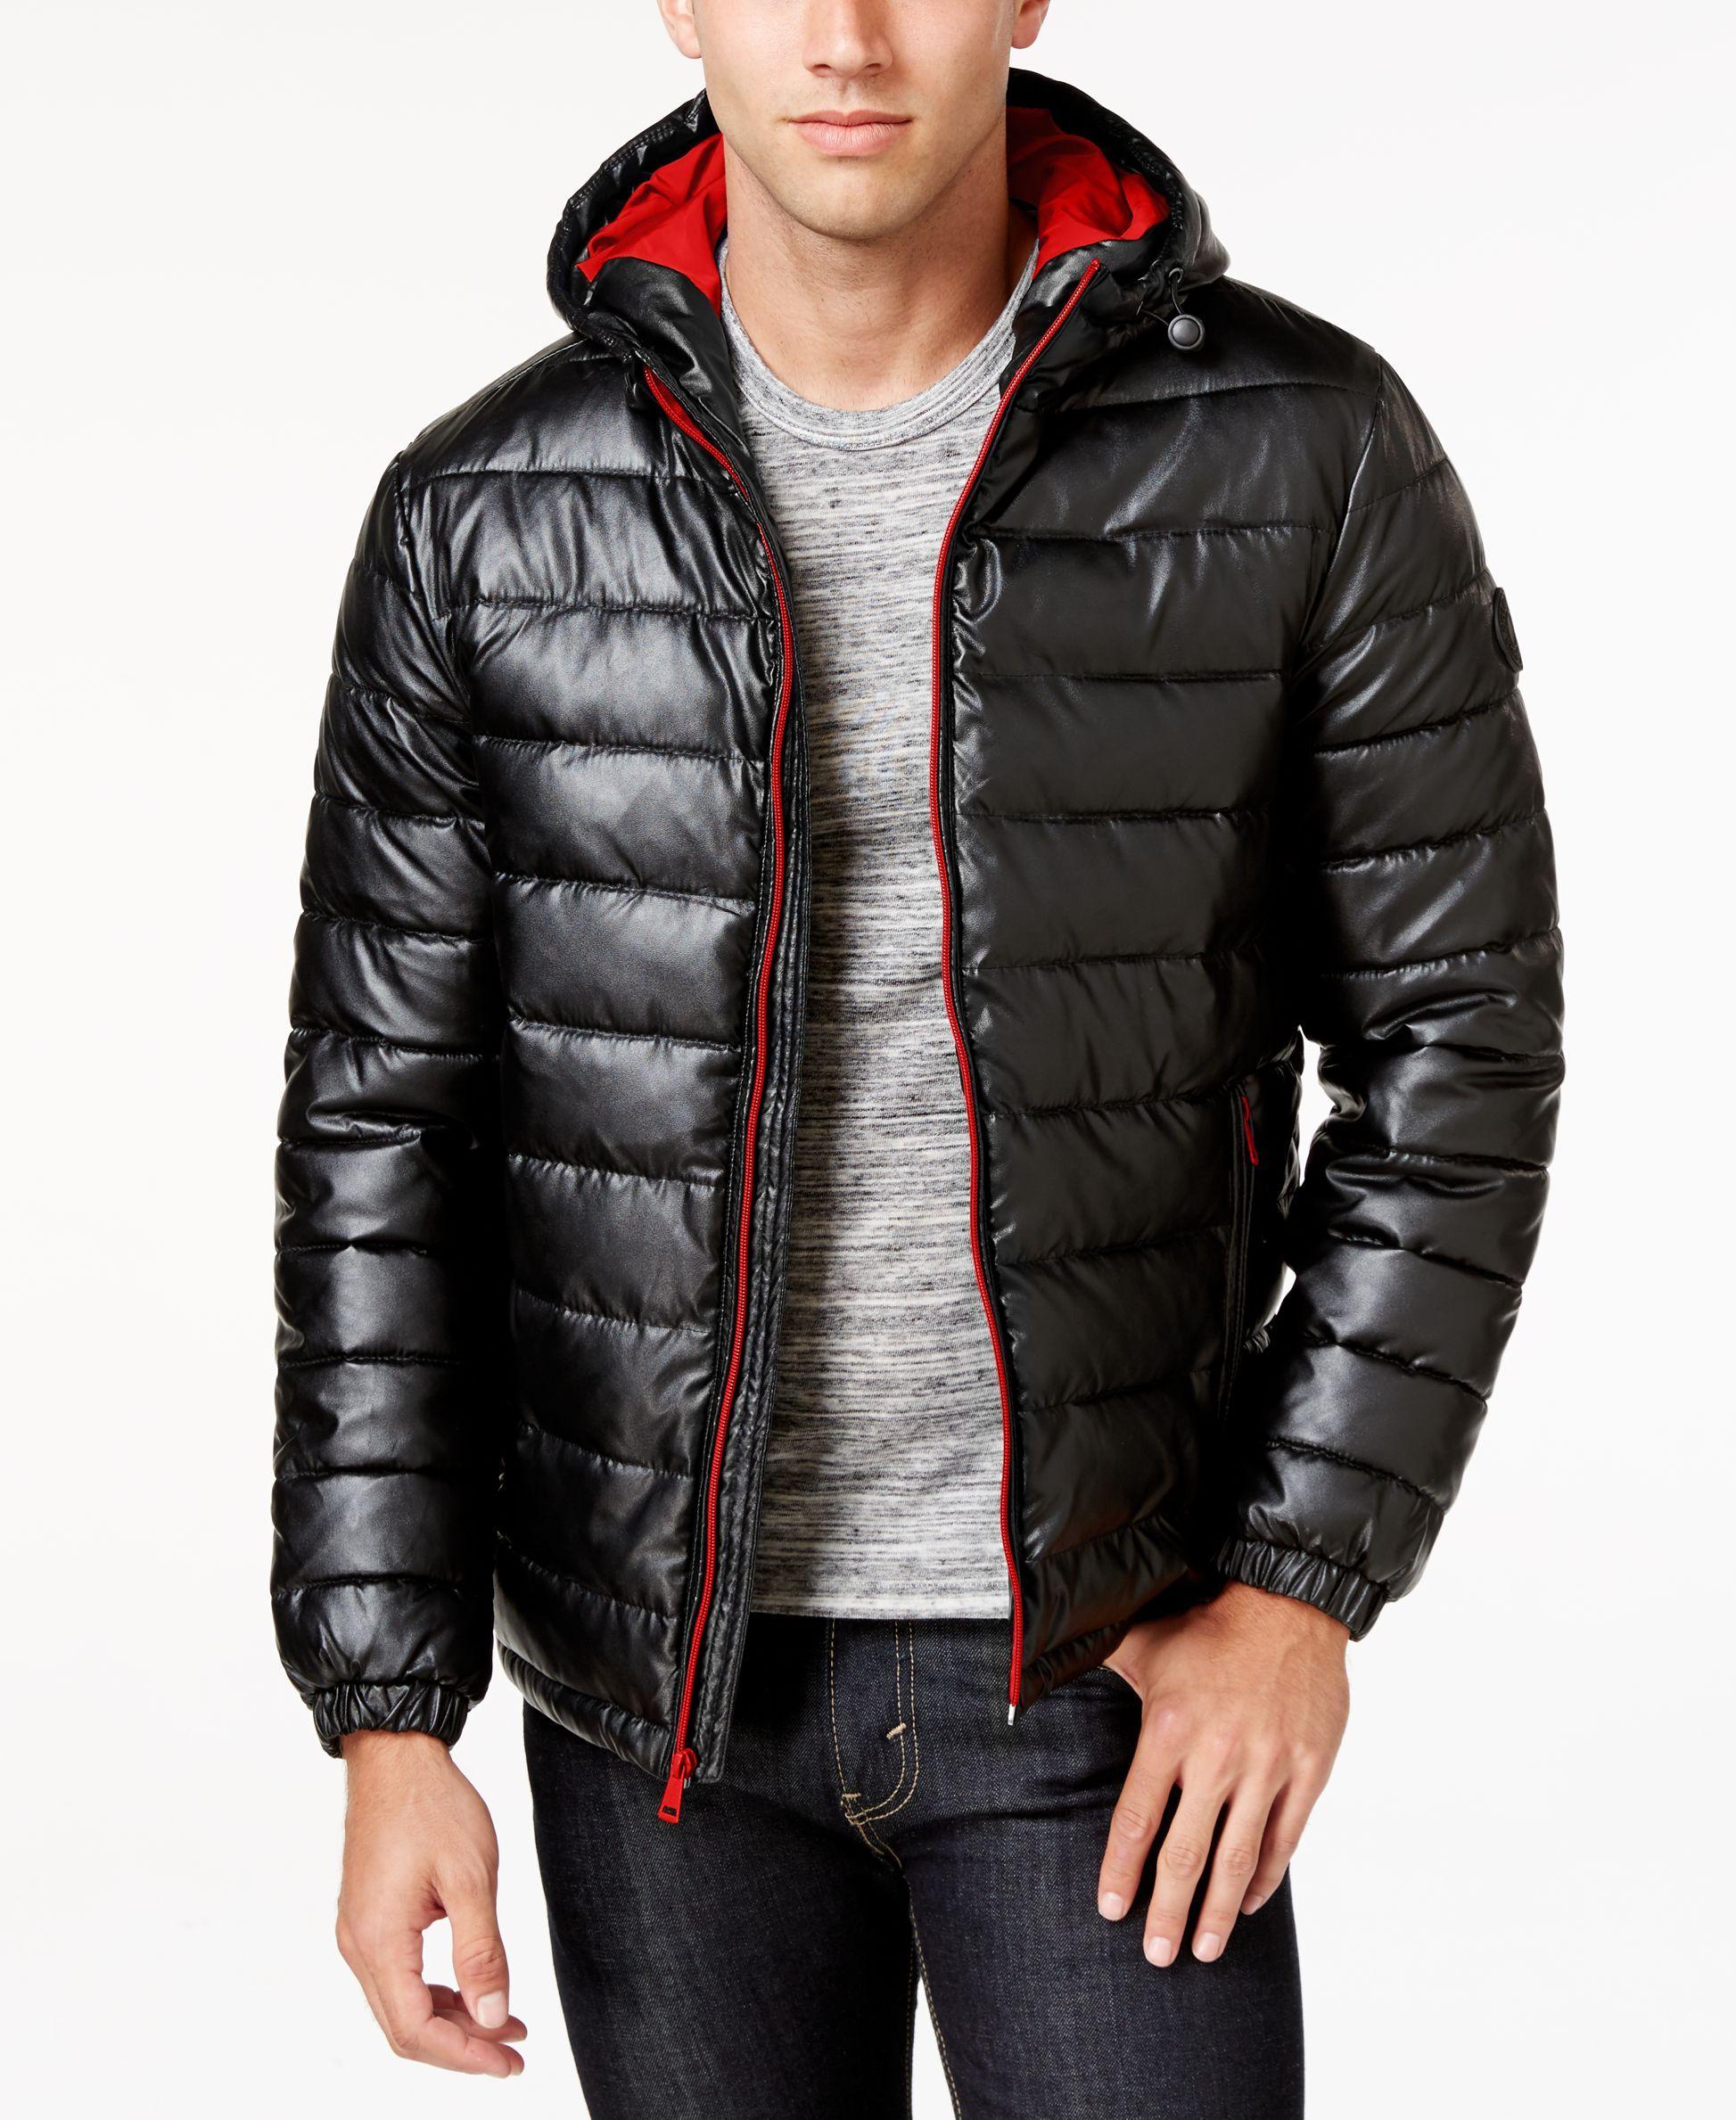 Weather or Not Taupe Vegan Leather Puffer Jacket Vegan